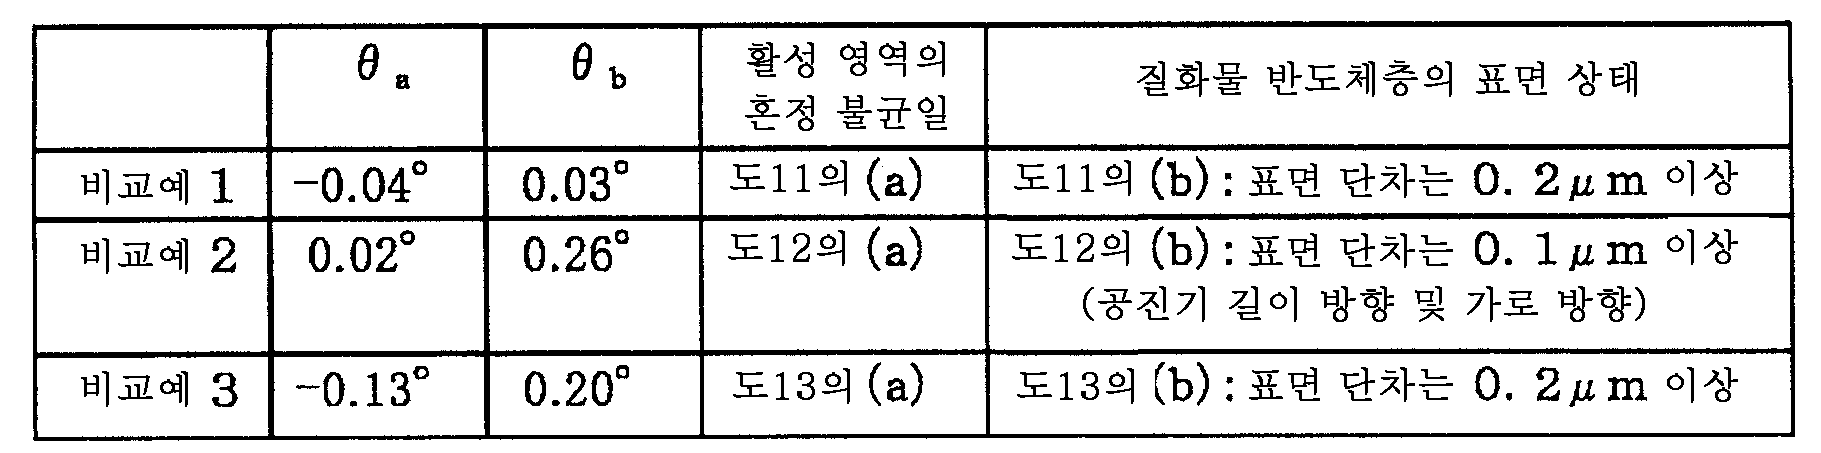 Figure 112005017464102-pat00010